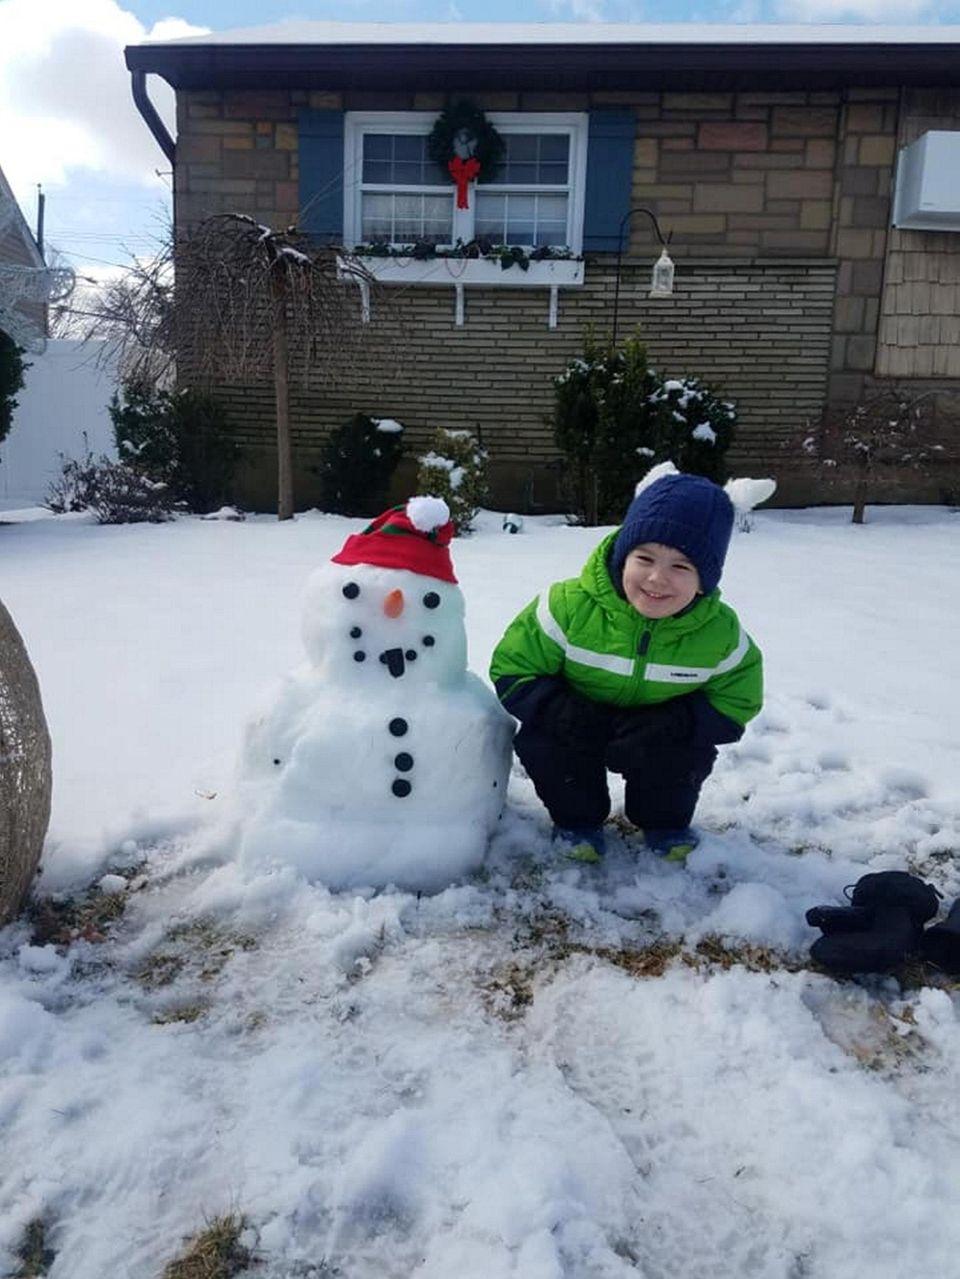 His name is Brayden the Snowman.